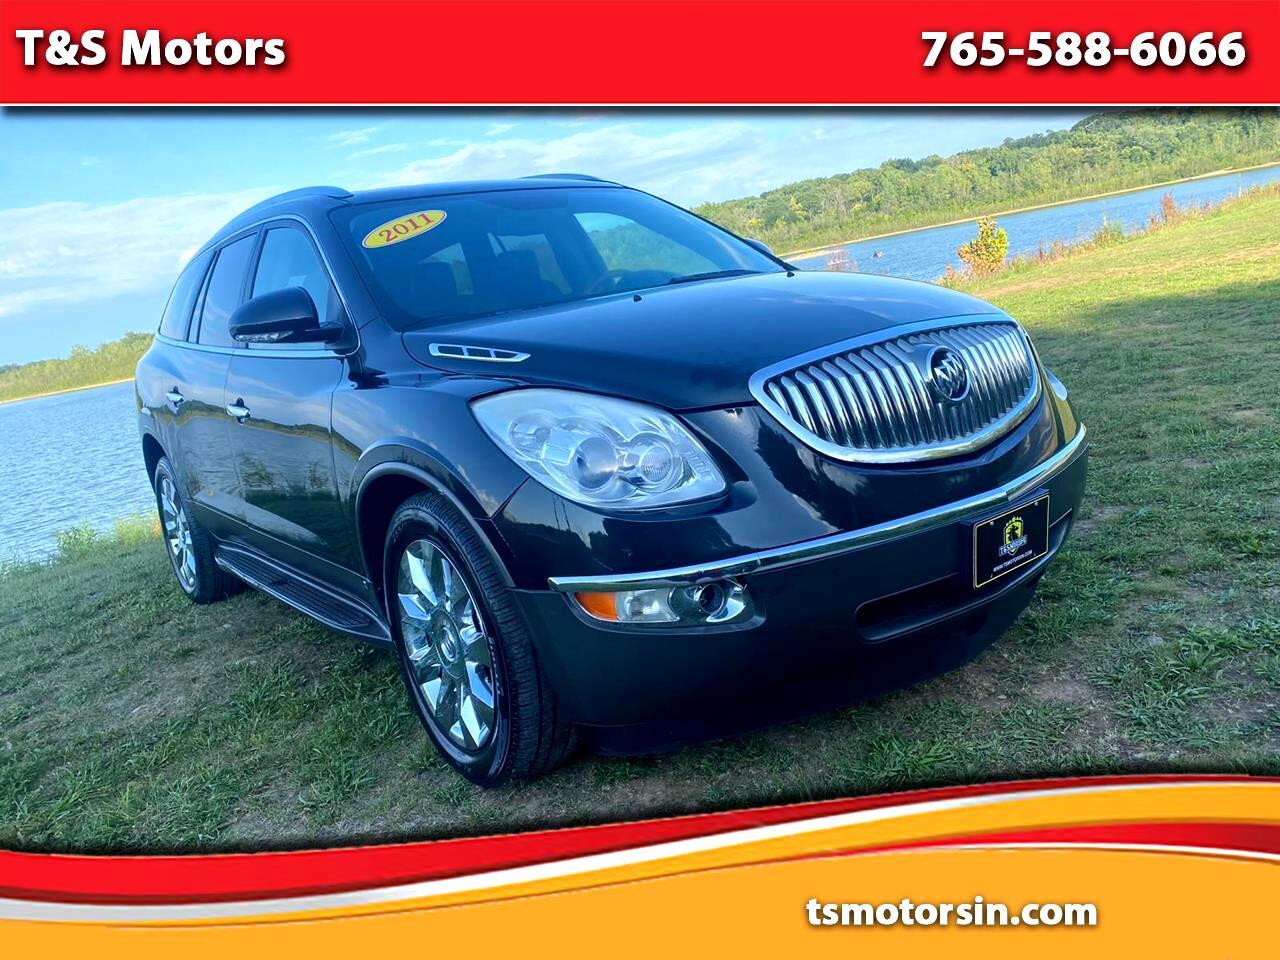 Buick Enclave CXL-2 AWD 2011